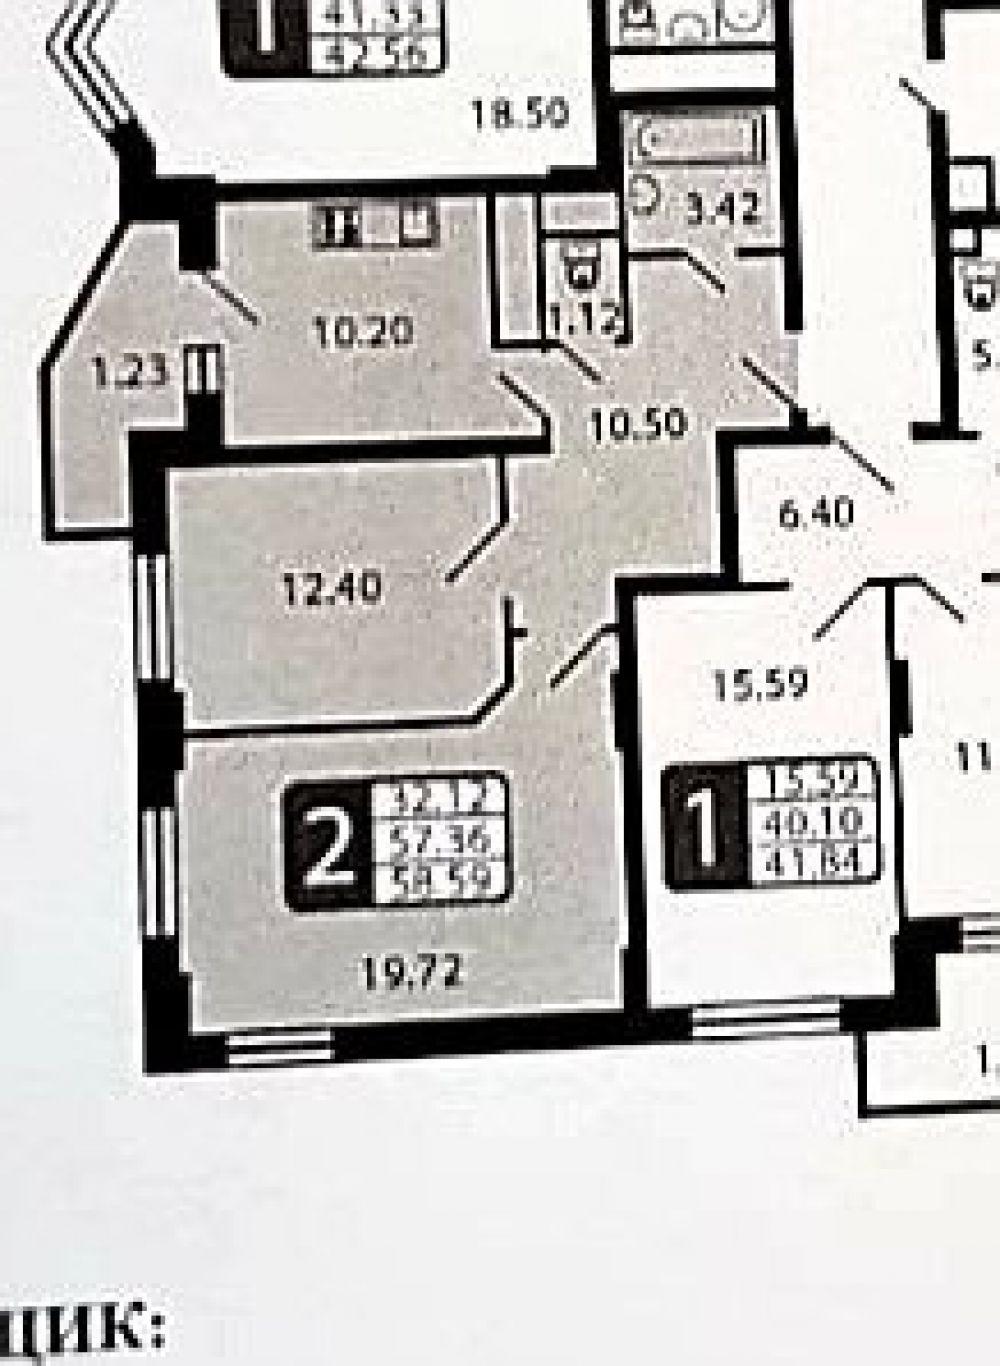 2-к квартира, Щелково, микрорайон Богородский, 22, фото 14